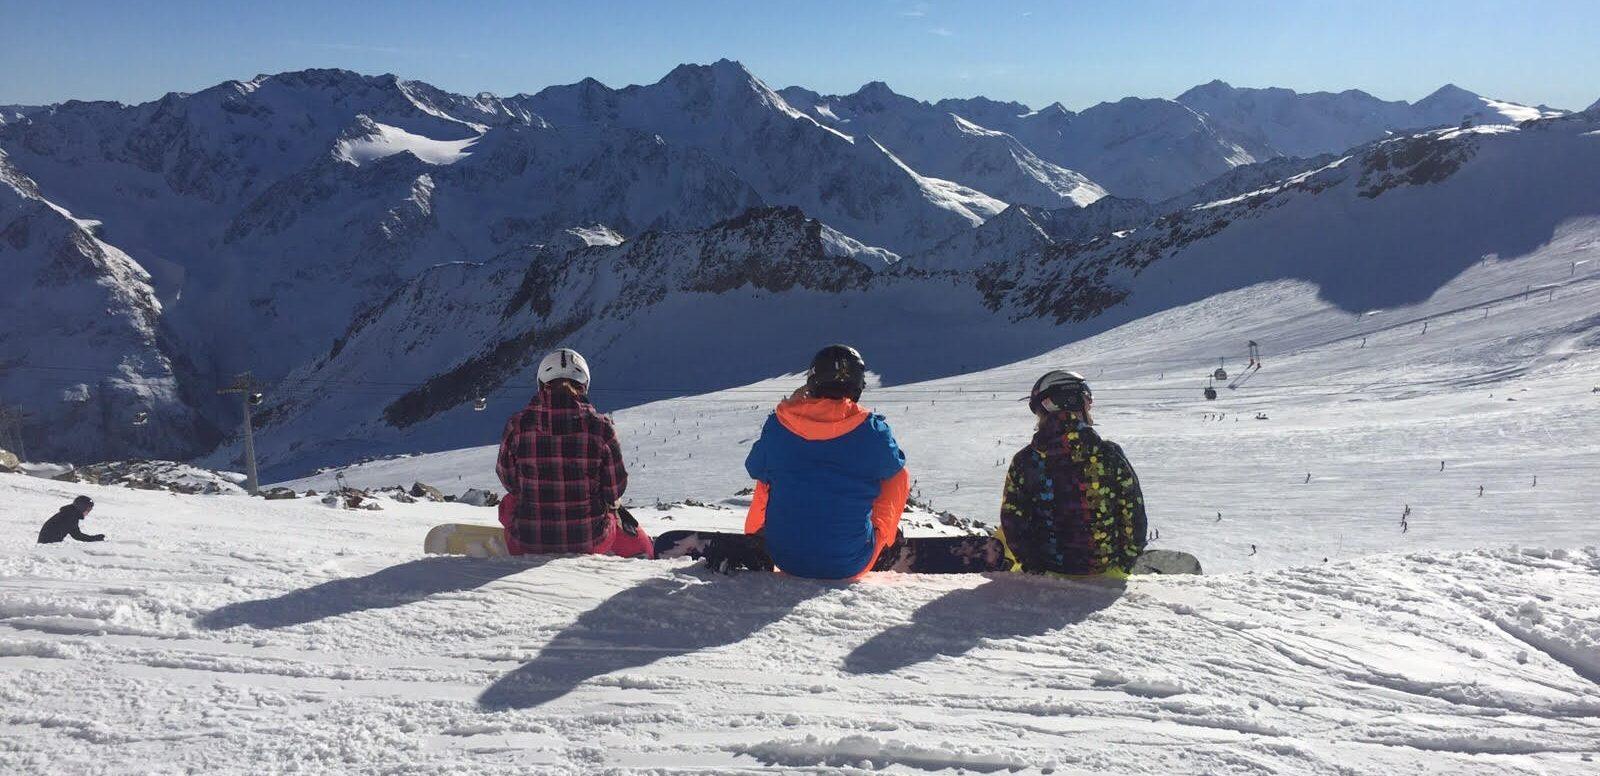 Snowboarders in Sölden